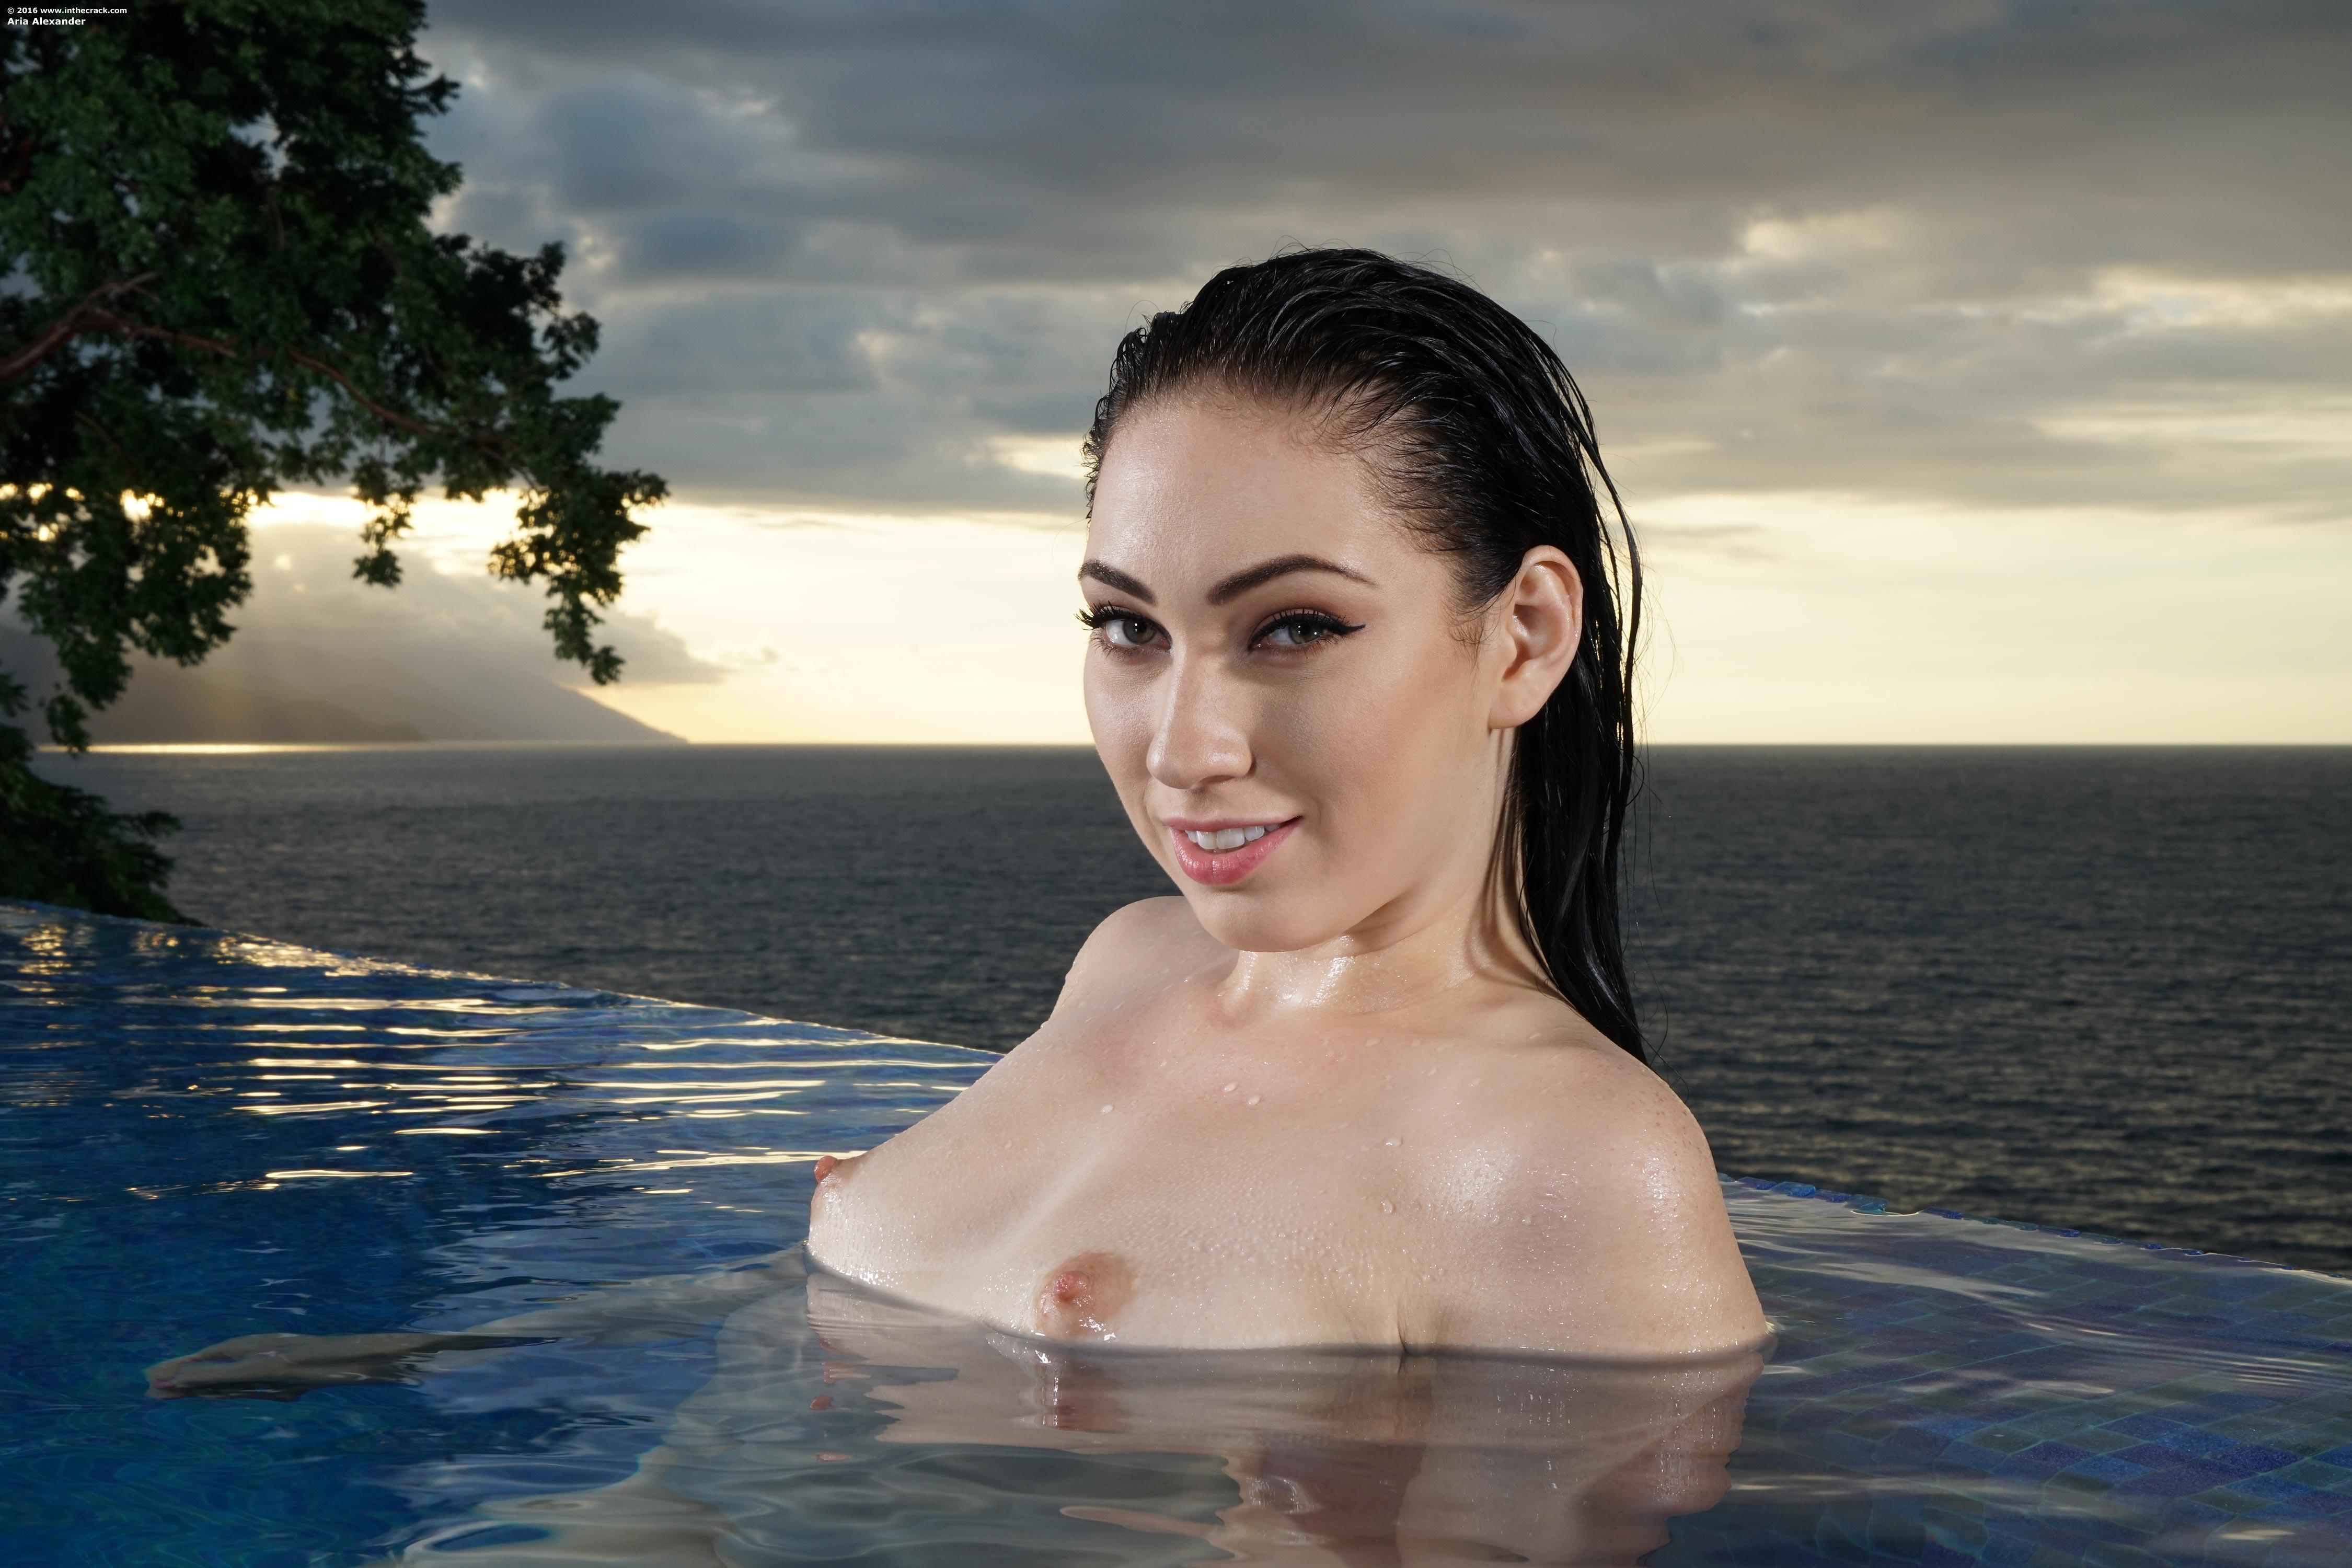 Massive tits feat chole khan nude (88 photos), Leaked Celebrites photo